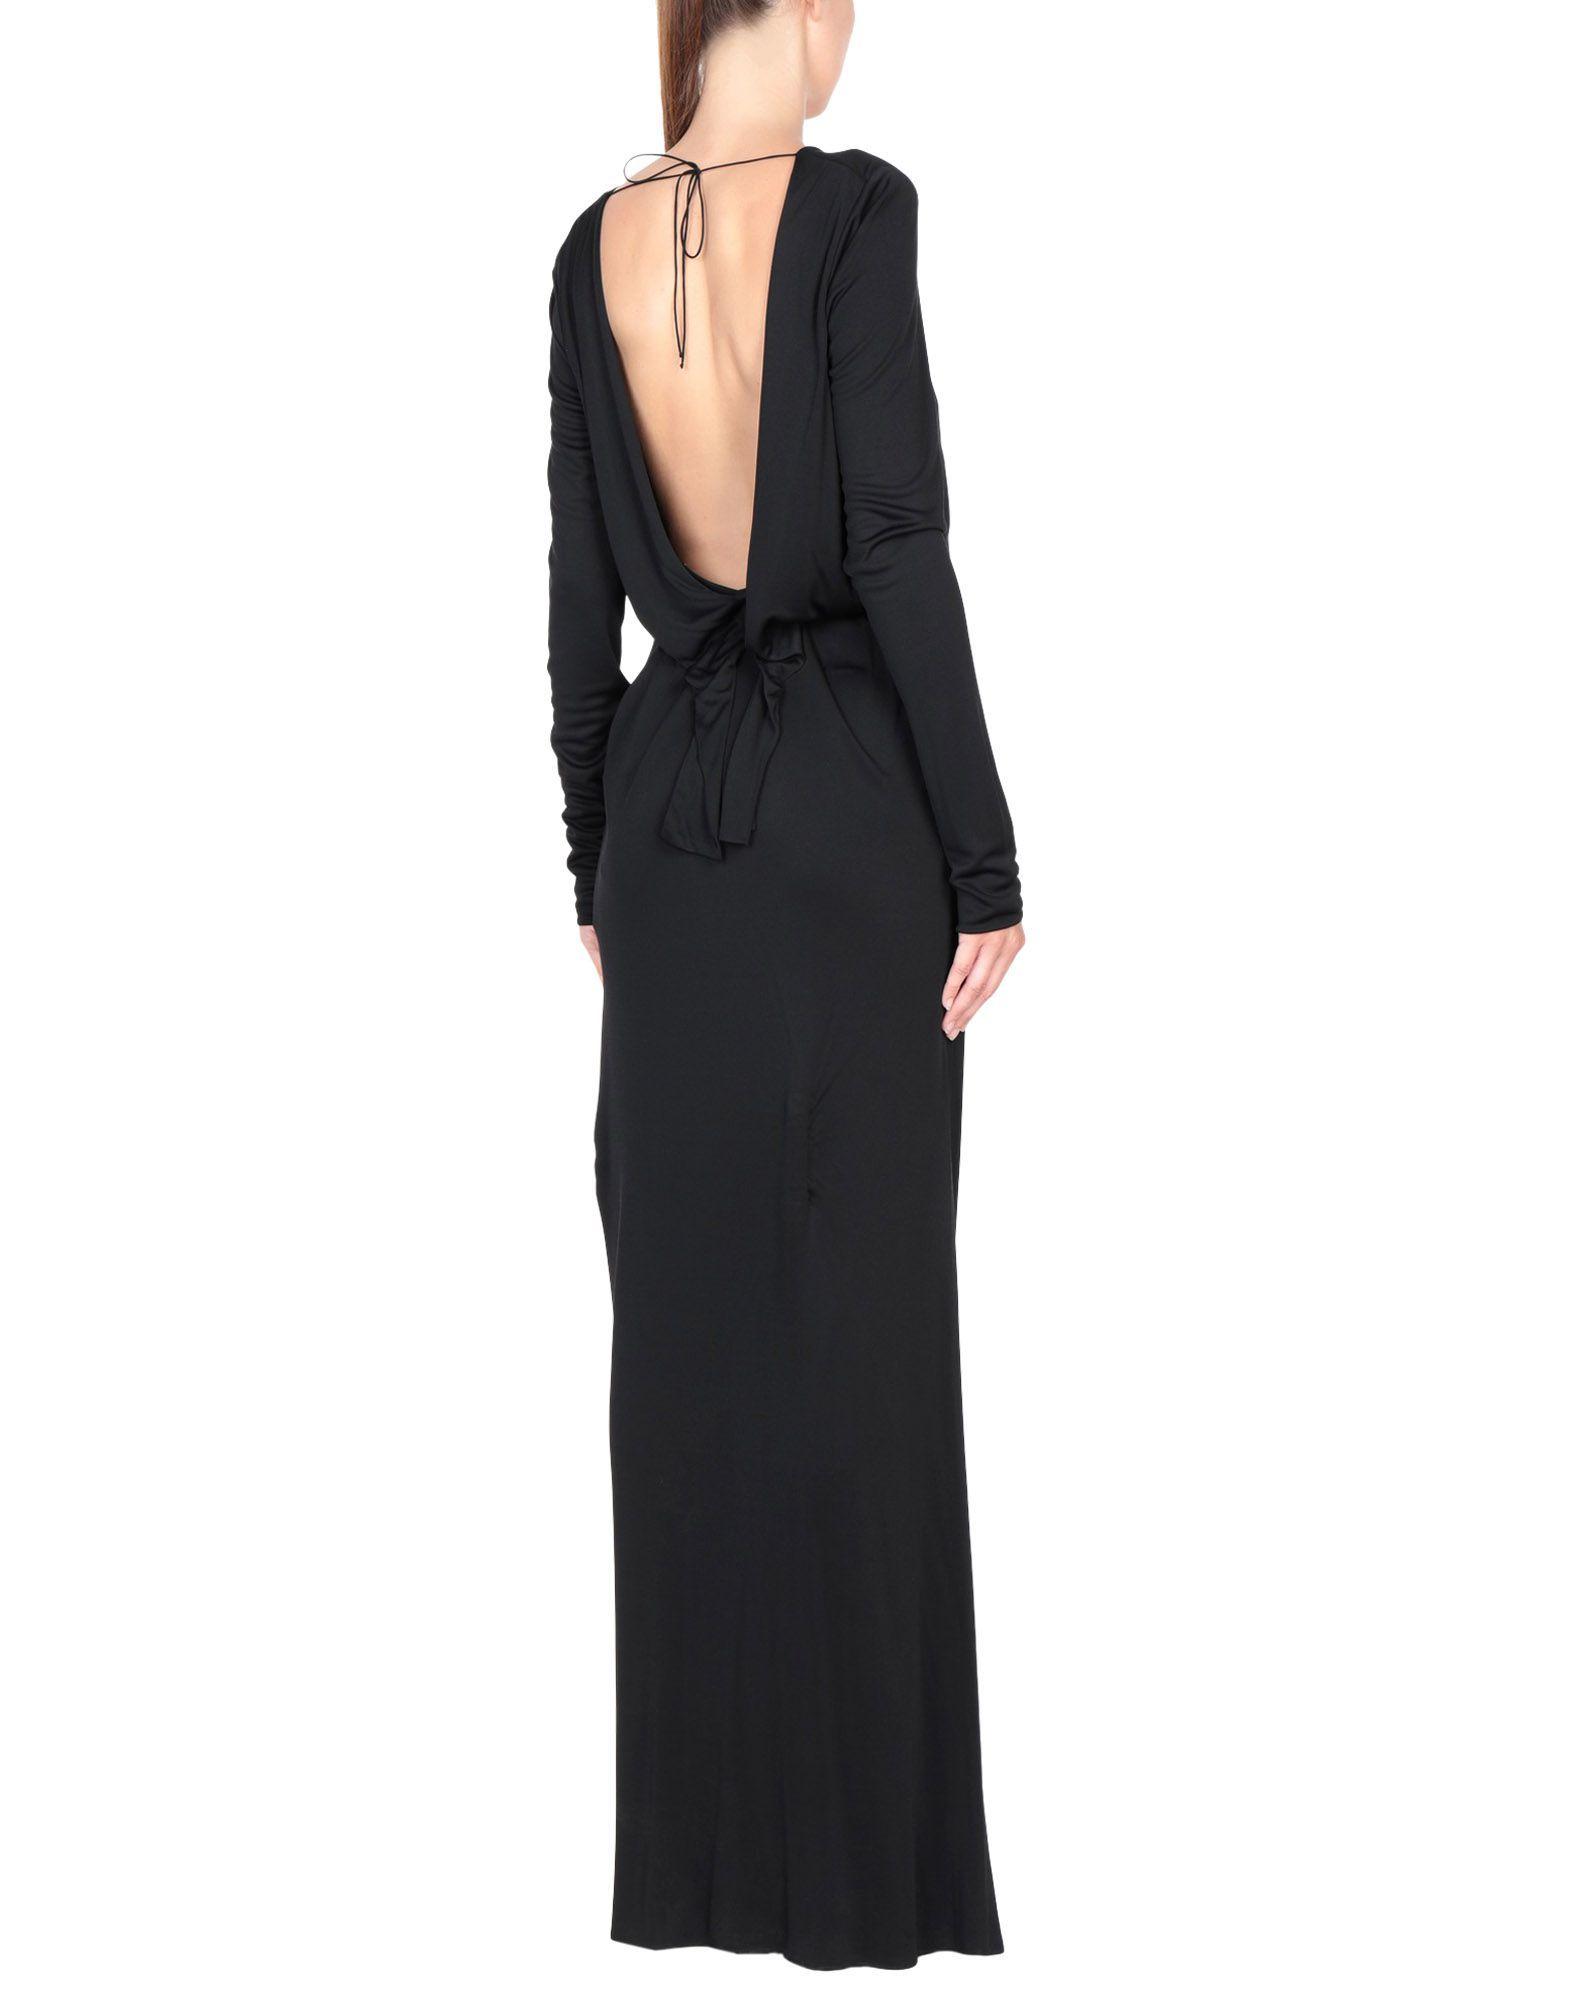 Emilio Pucci Black Long Sleeve Full Length Dress